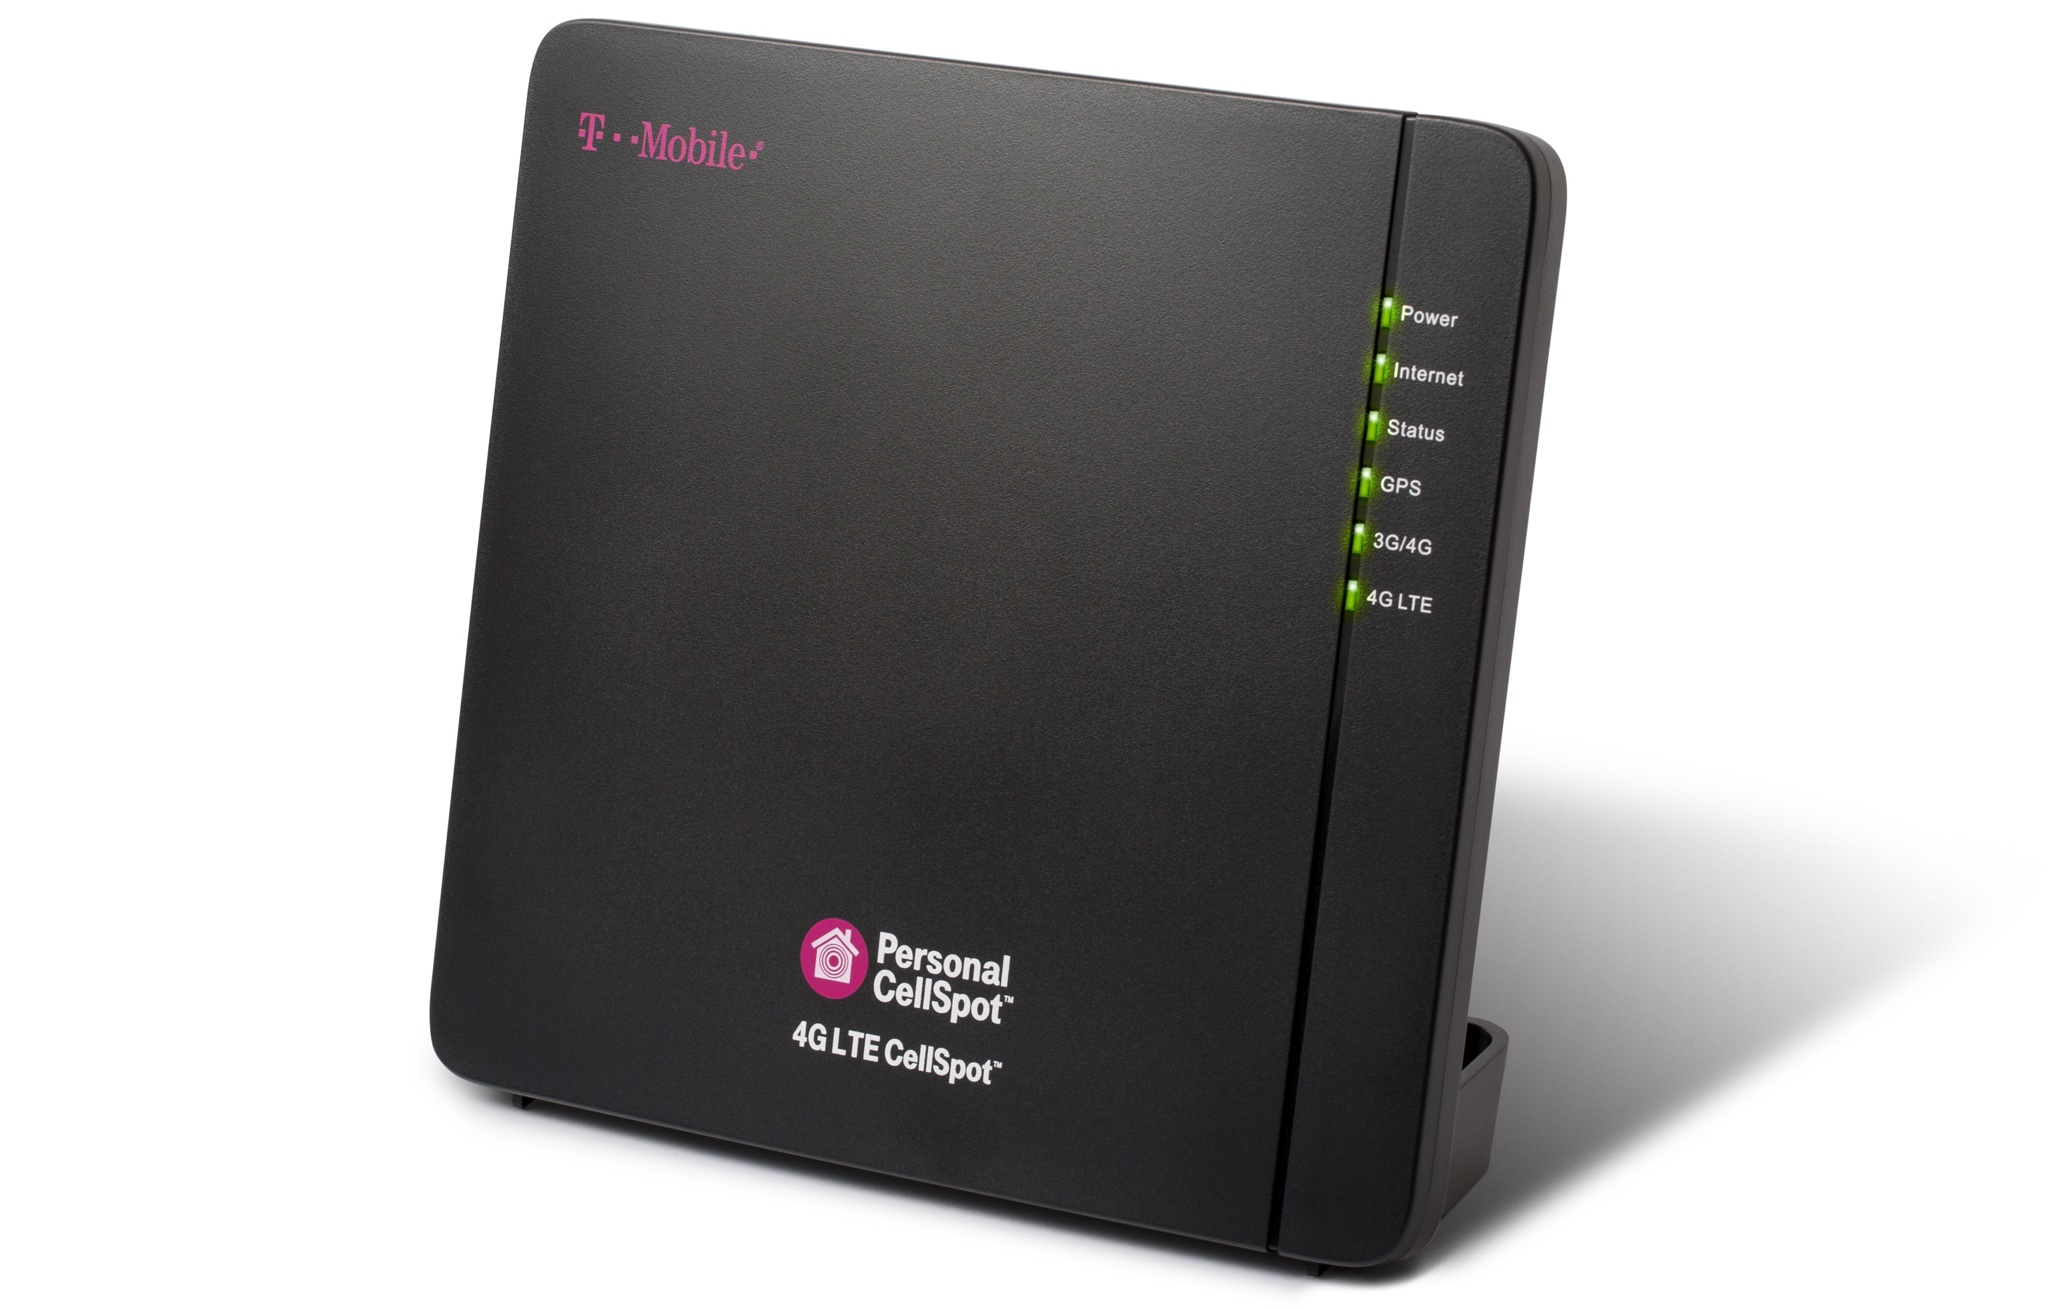 T-Mobile CellSpot image 001